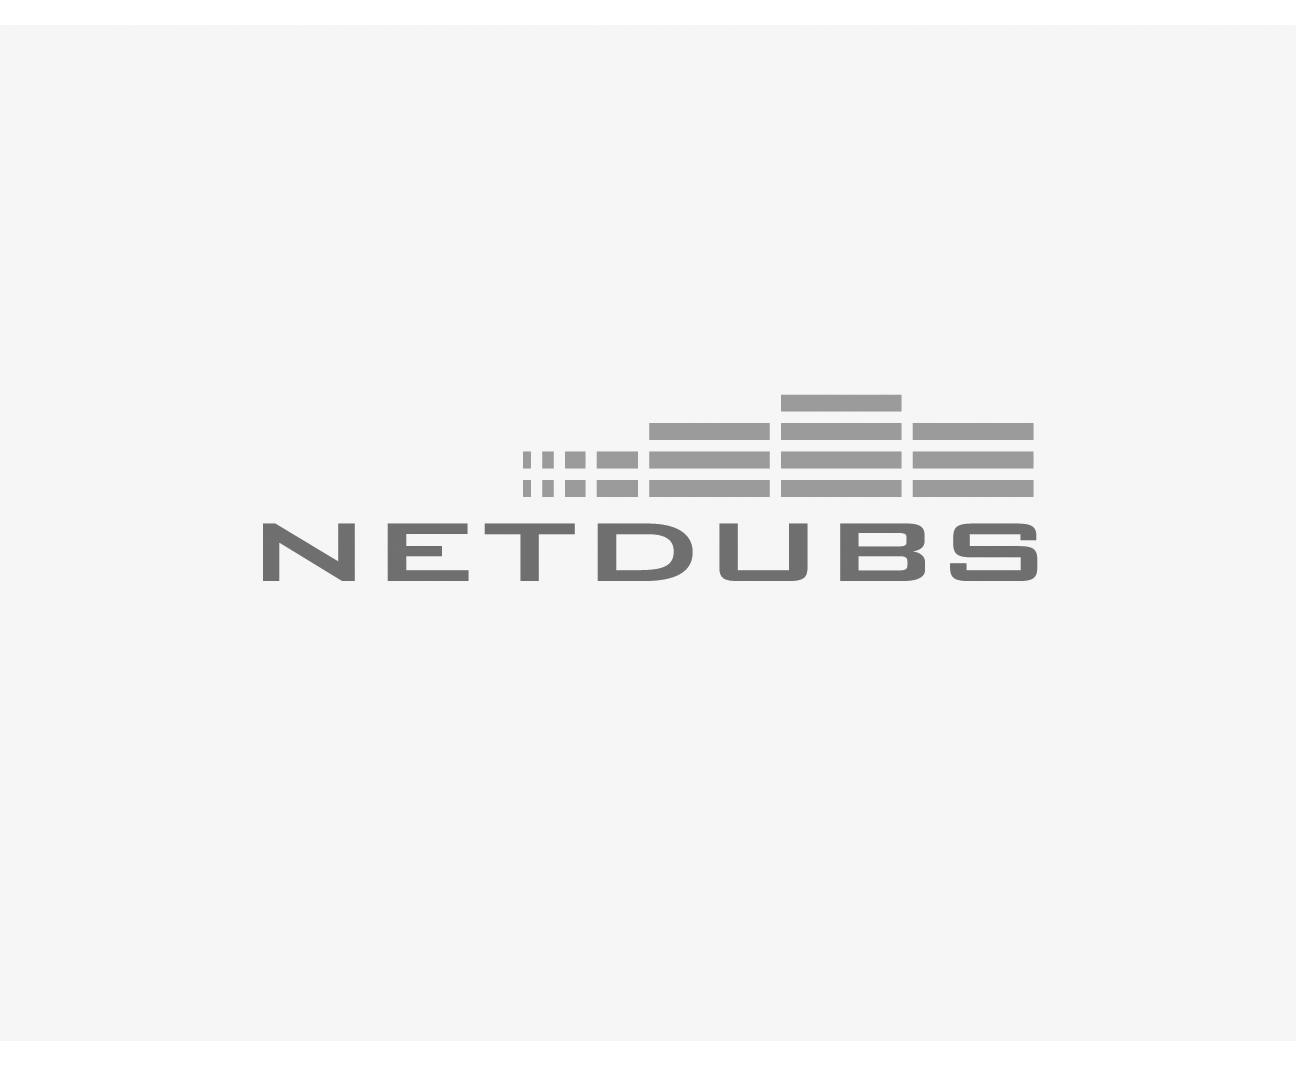 logo_netdubs_gs.jpg